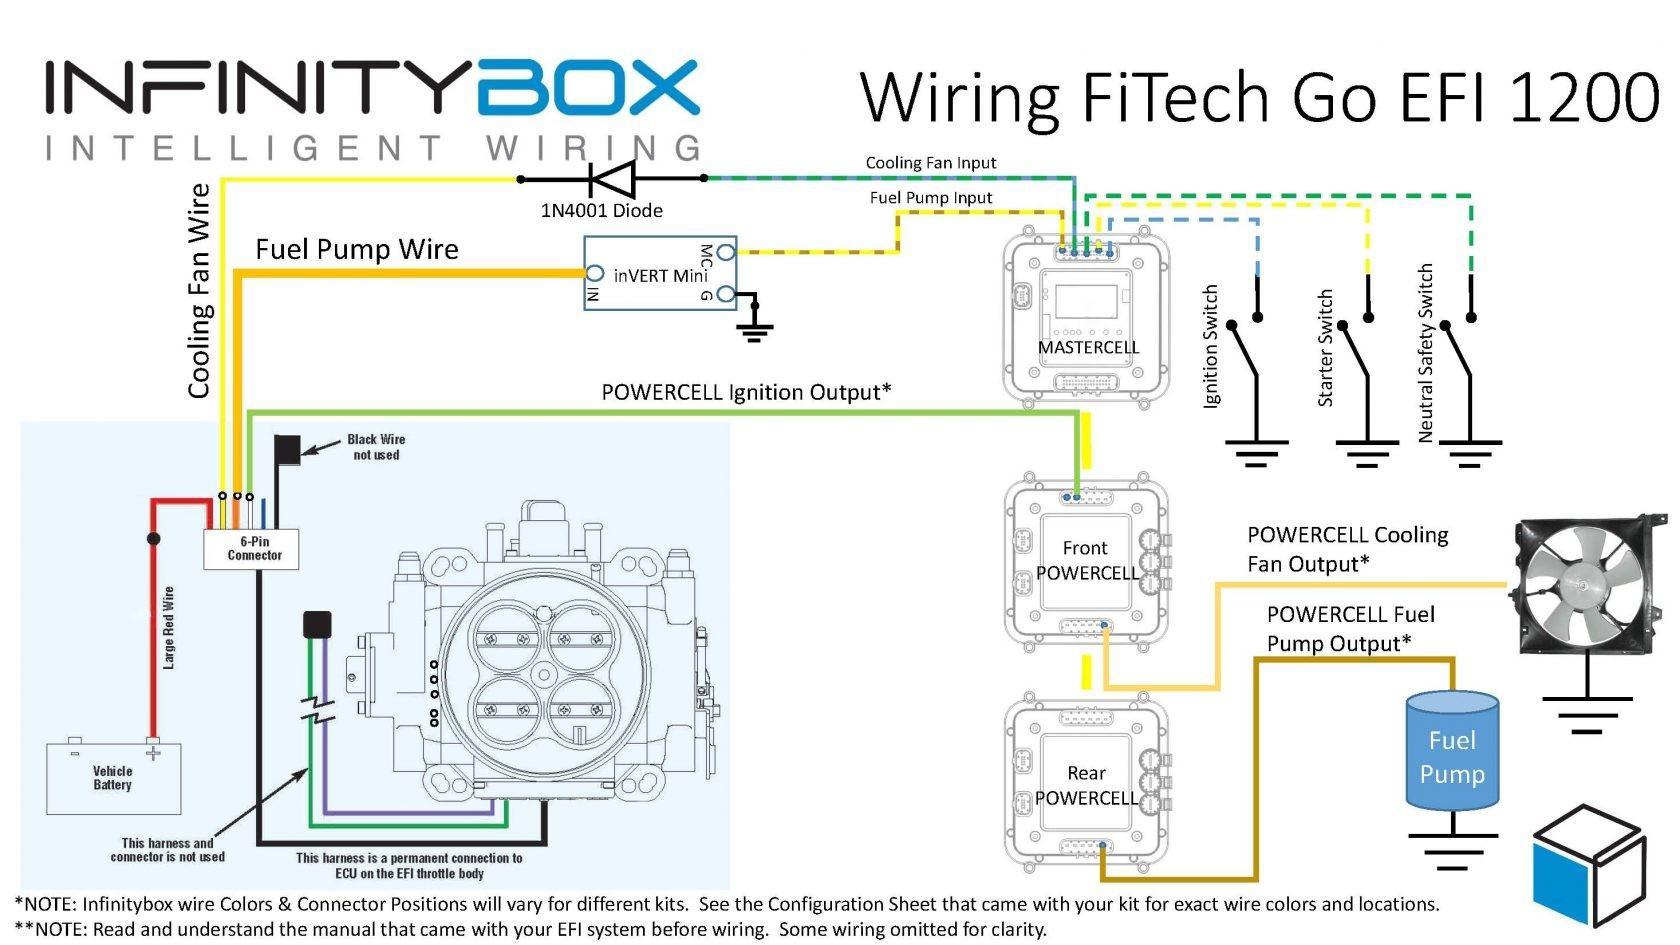 Fitech Wiring Diagram Elegant